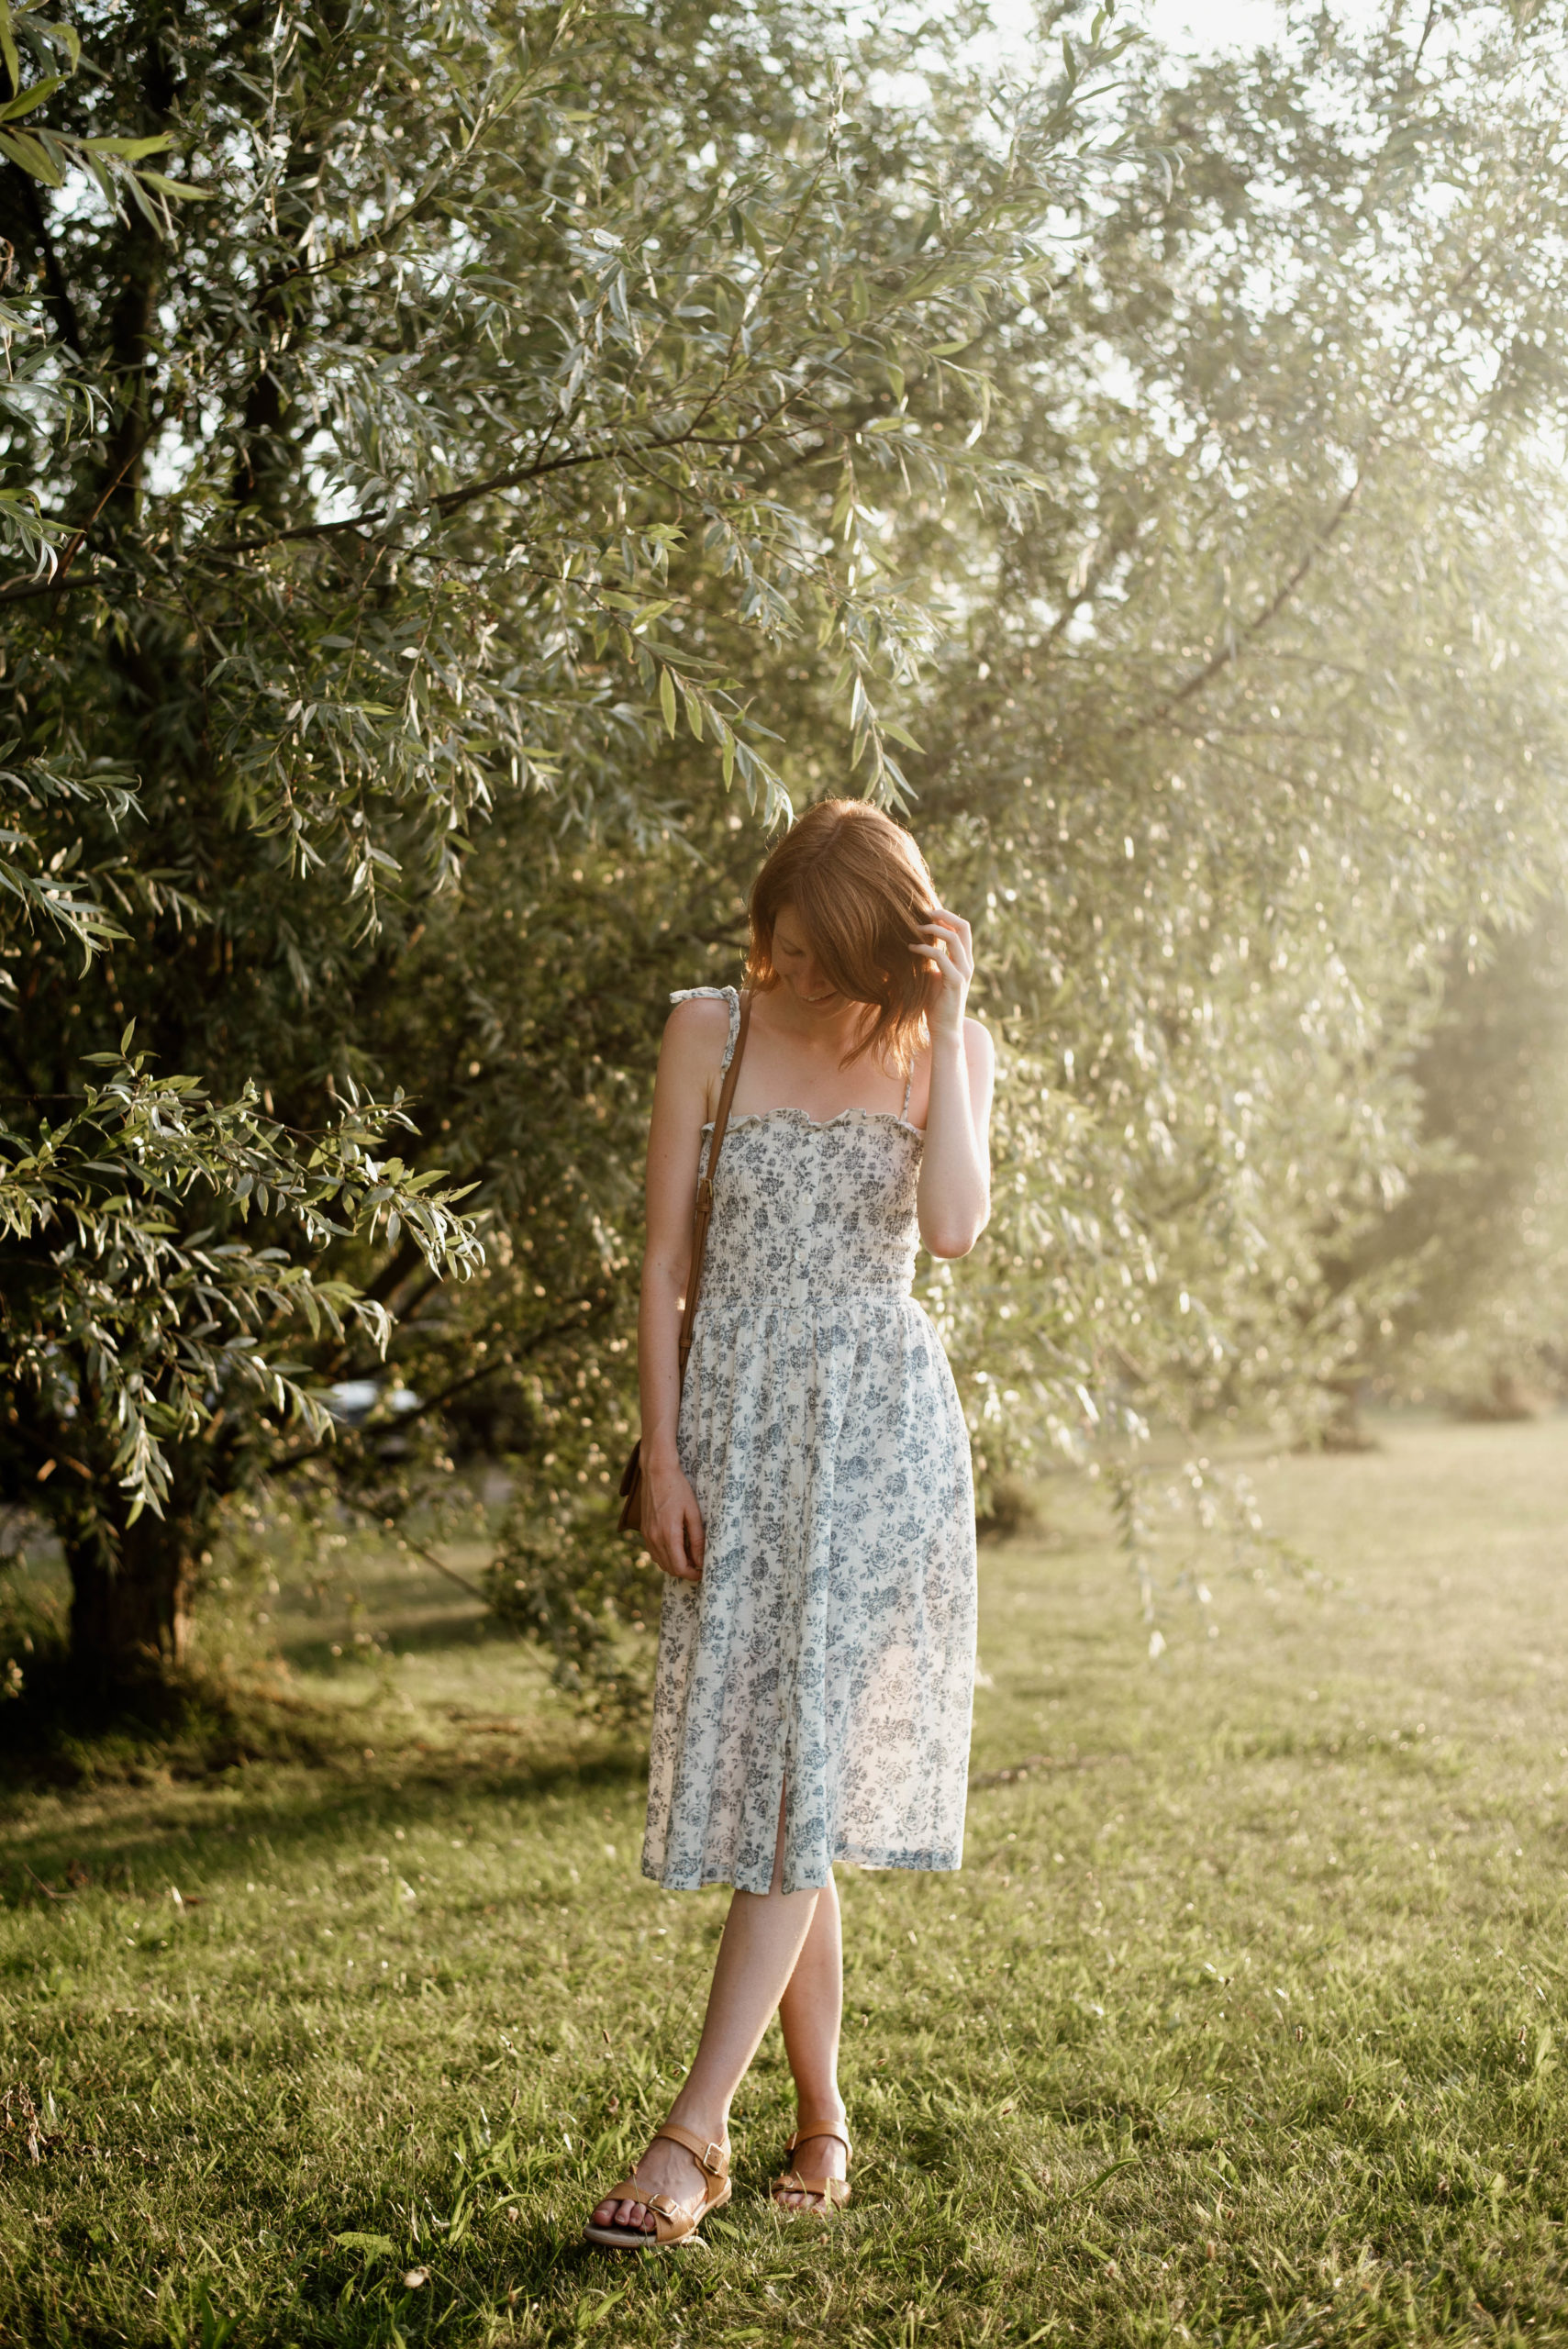 A Simple Floral Sun Dress